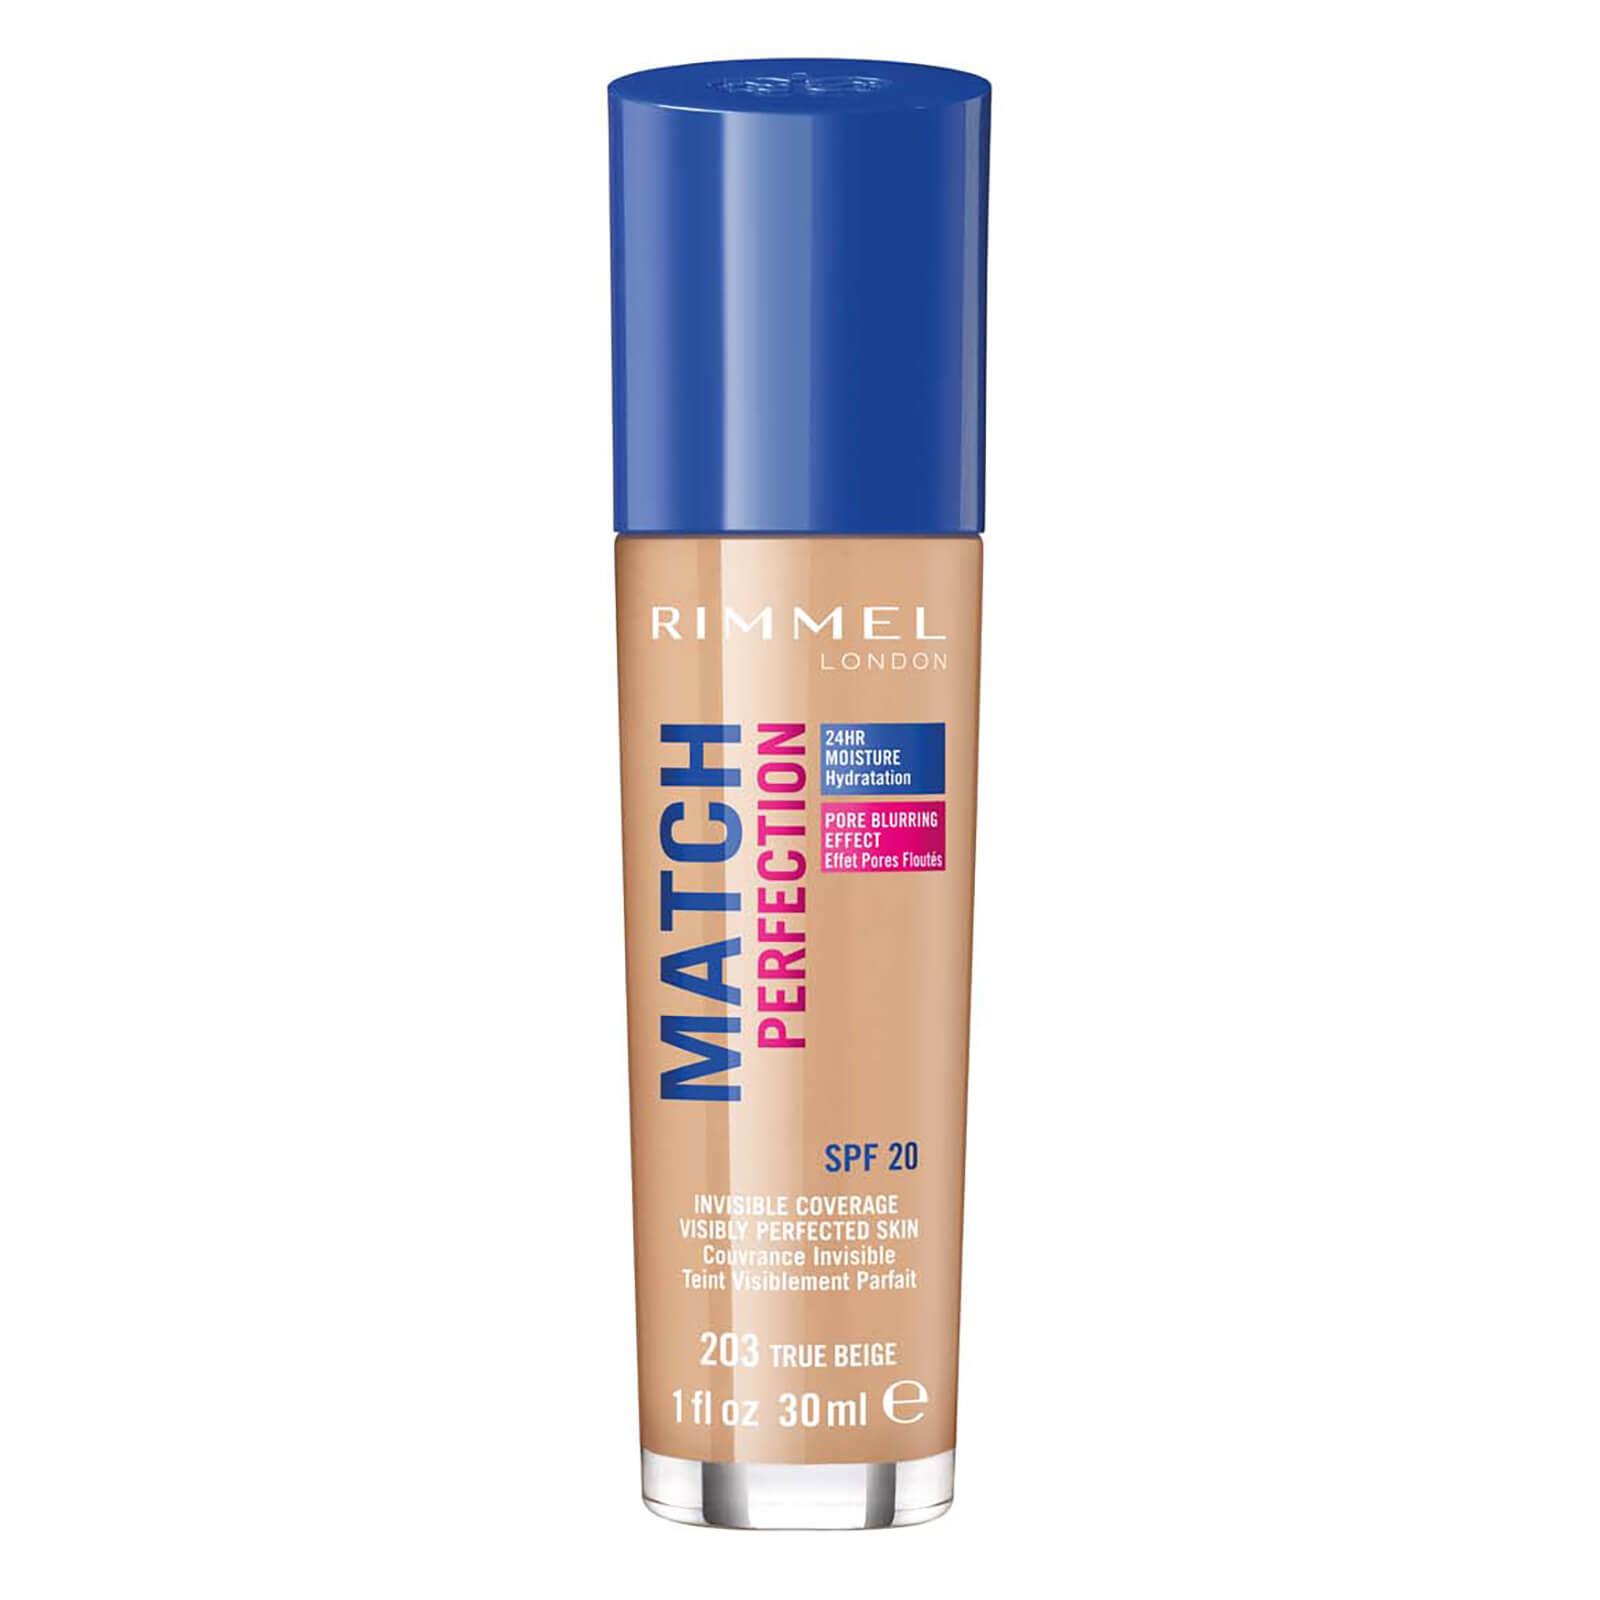 rimmel match perfection foundation 30ml (various shades) - true beige